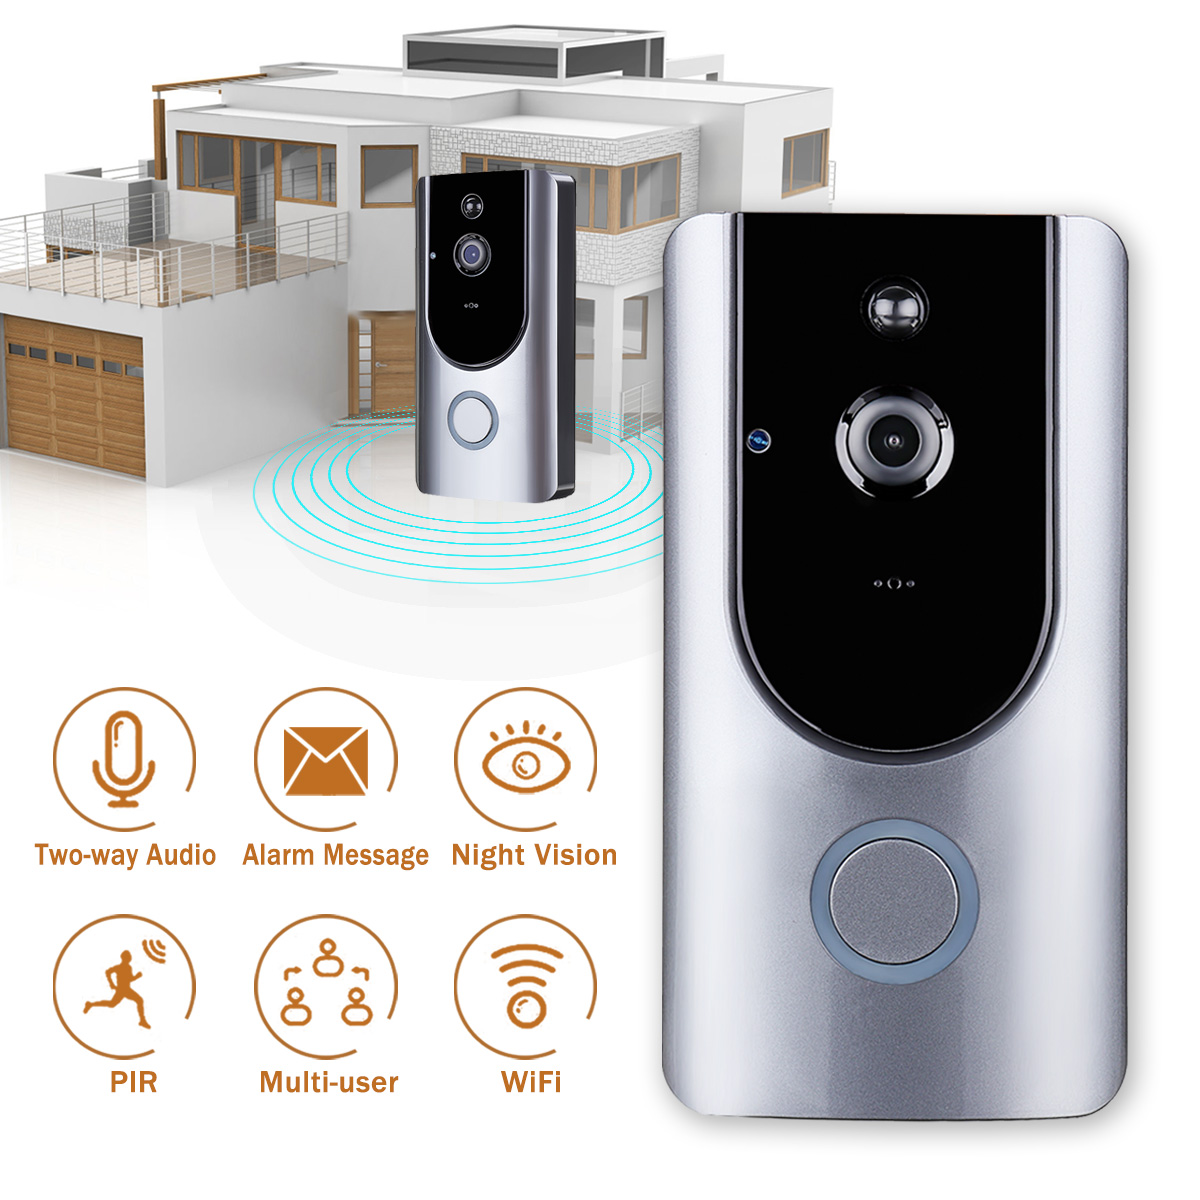 все цены на 1Set Wireless Video Door Phone HD PIR WIFI Doorbell Intercom Alarm Wireless Security Camera Outdoor Doorbell онлайн